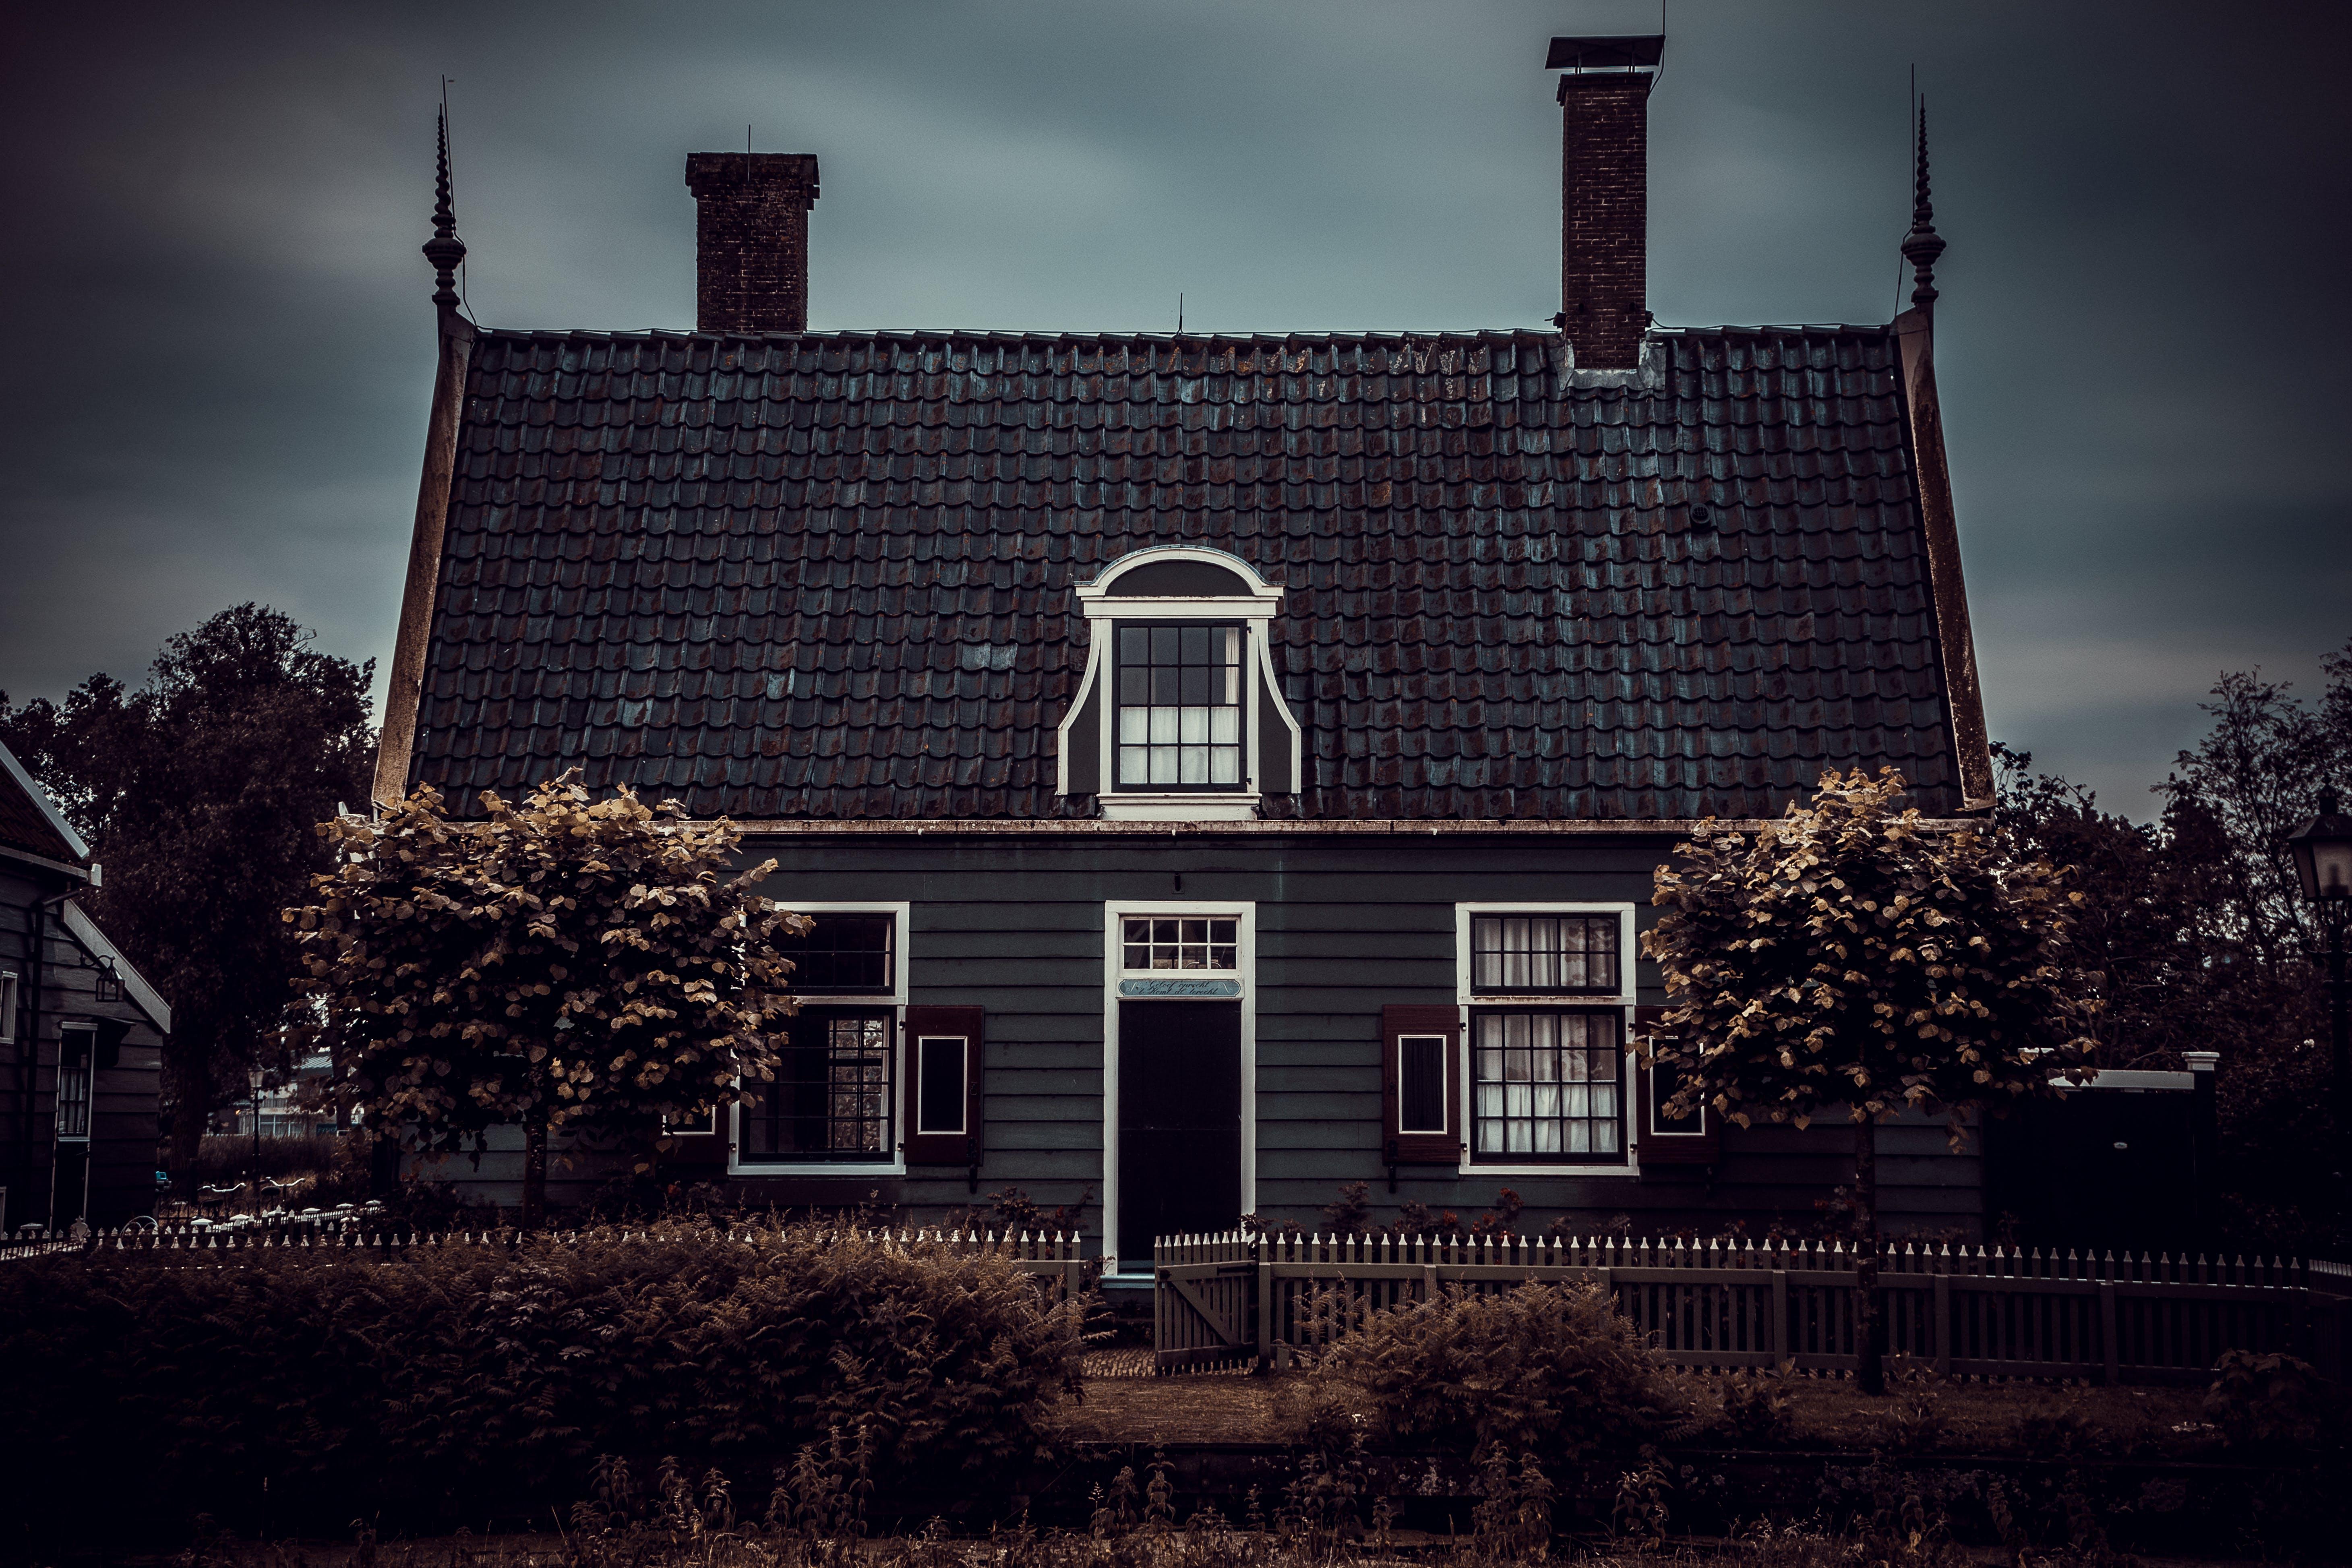 Free stock photo of village, dark, house, fence